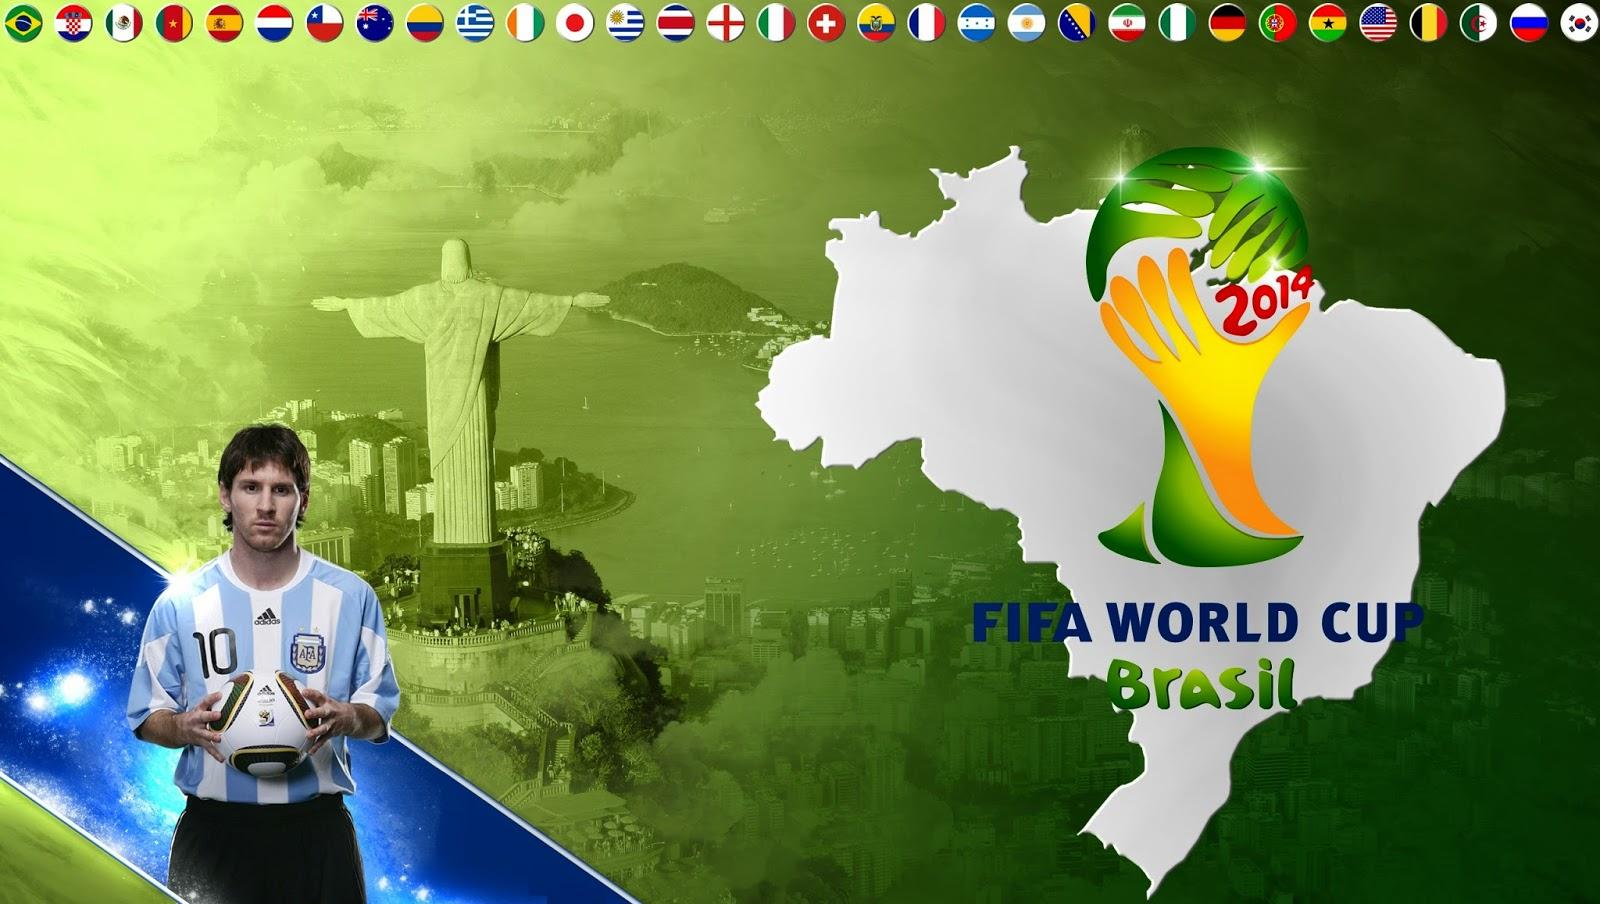 Hd wallpaper neymar - 2014 Fifa World Cup Wallpaper Messi Viewing Gallery